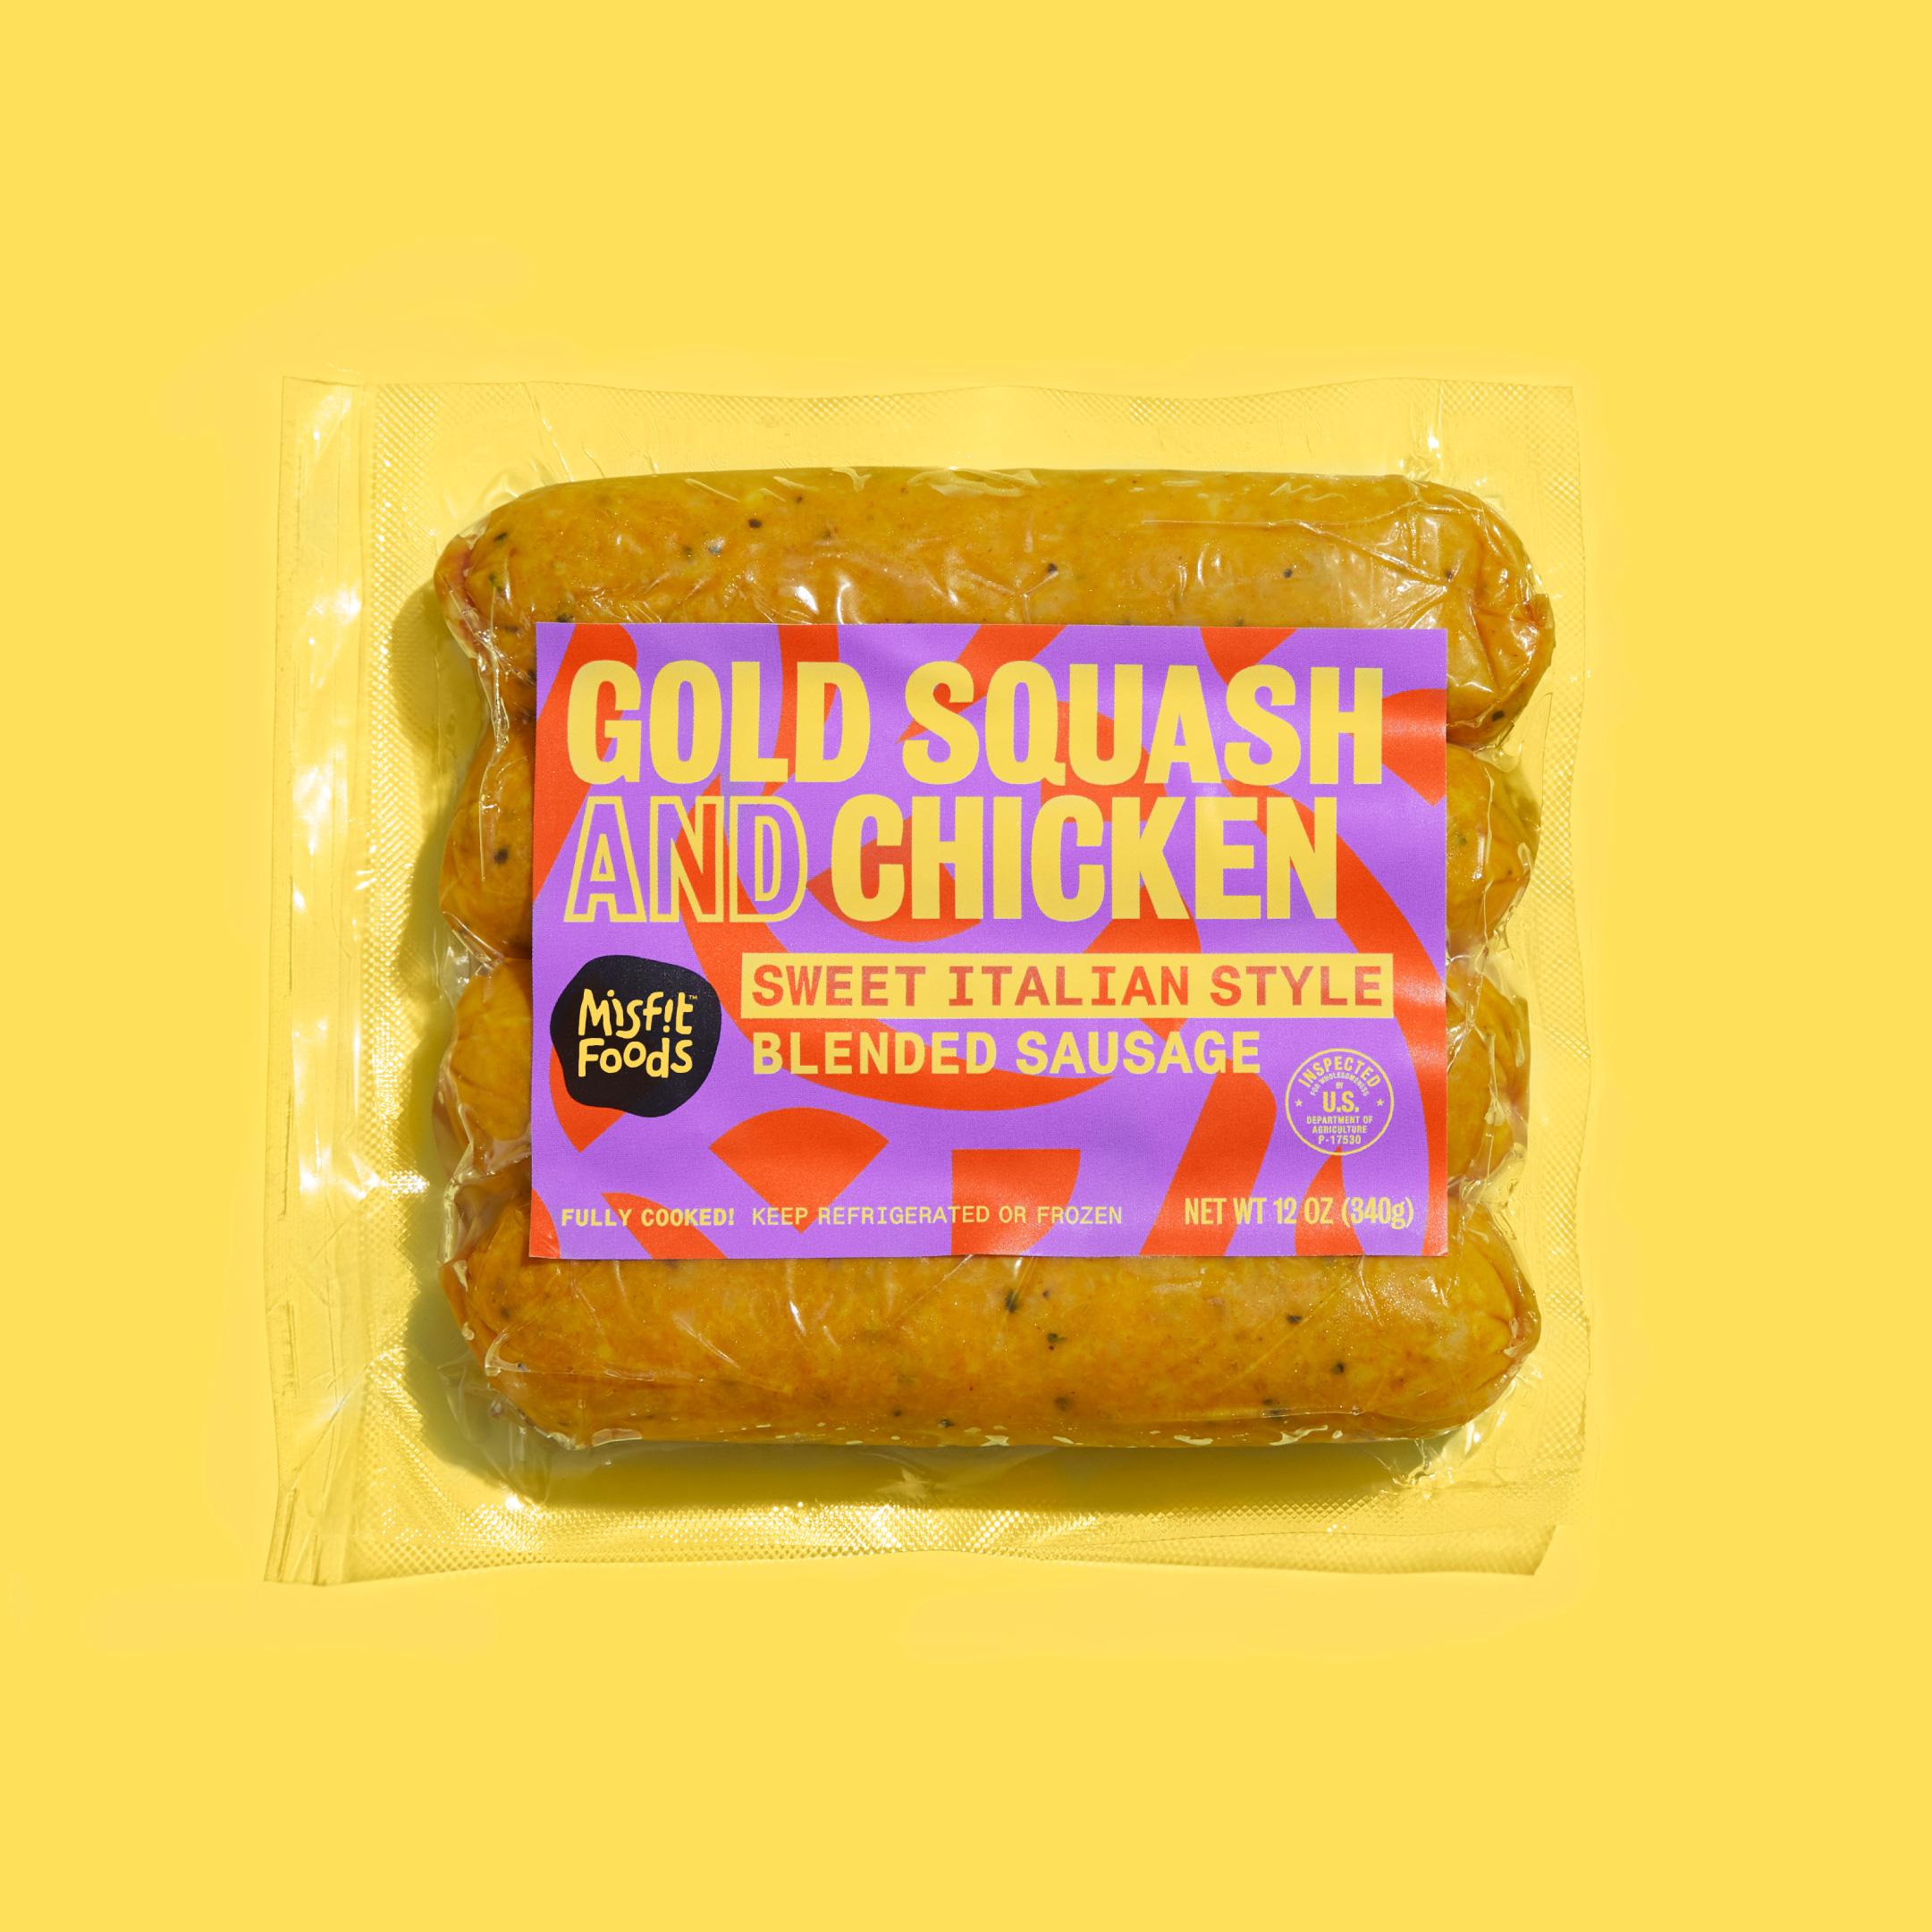 misfit-gold-squash-package@2x.jpg